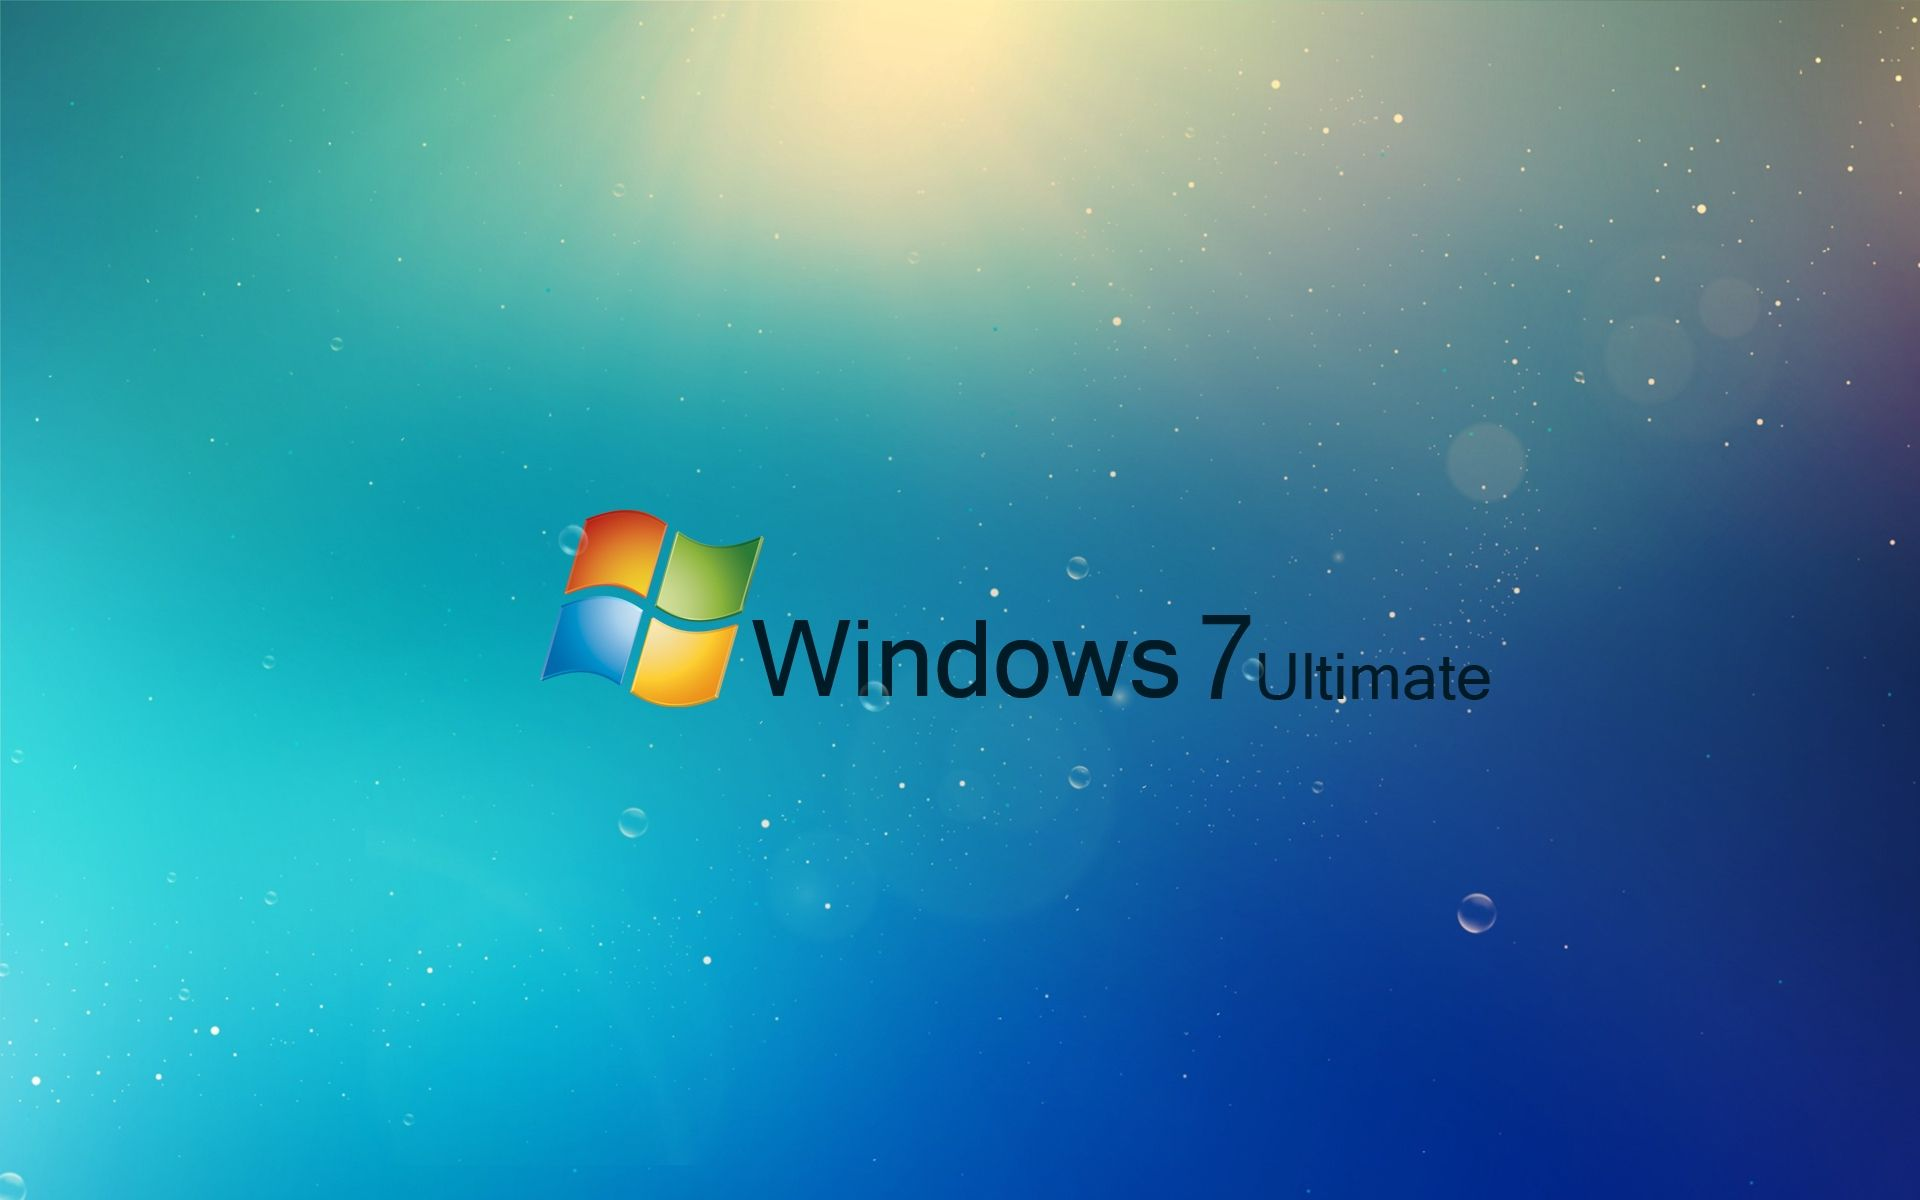 Wallpaper Windows 7 Full Hd Windows 7 Full Hd High Quality Download Wallpapers For Pc Windows Wallpaper New Wallpaper Hd